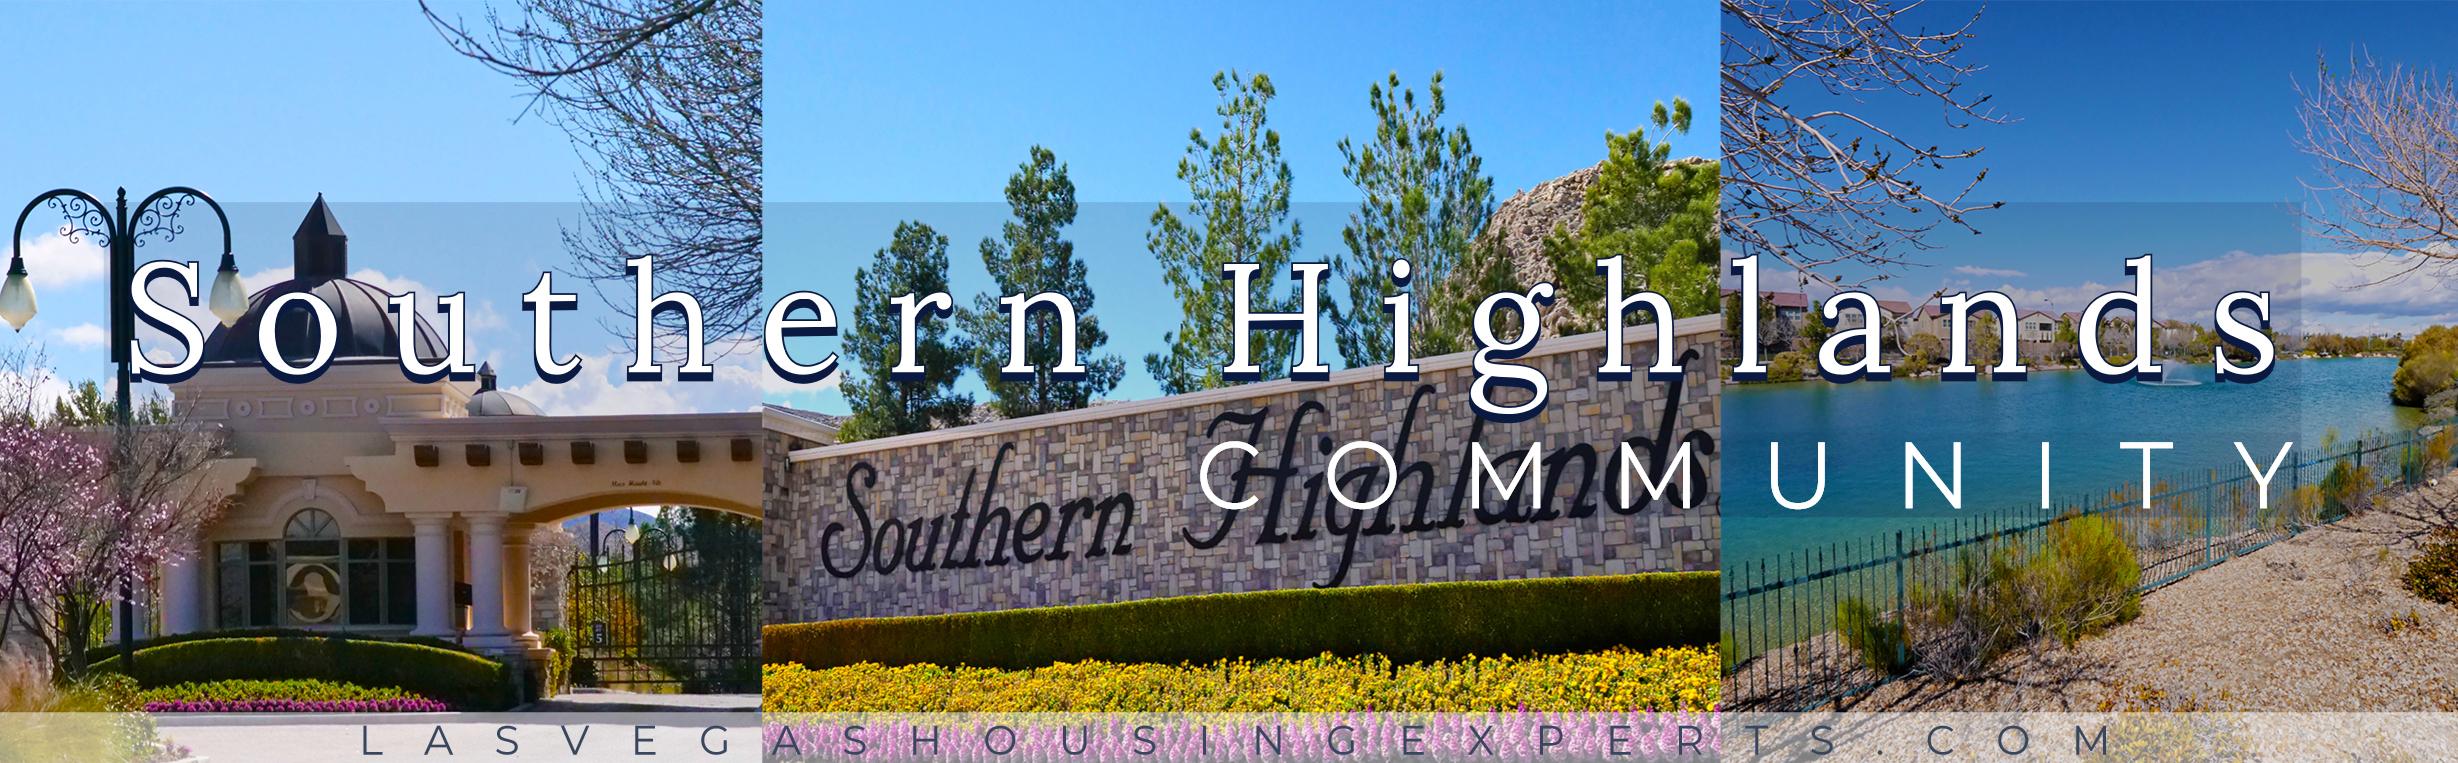 Southern Highlands Las Vegas Housing Experts real estate